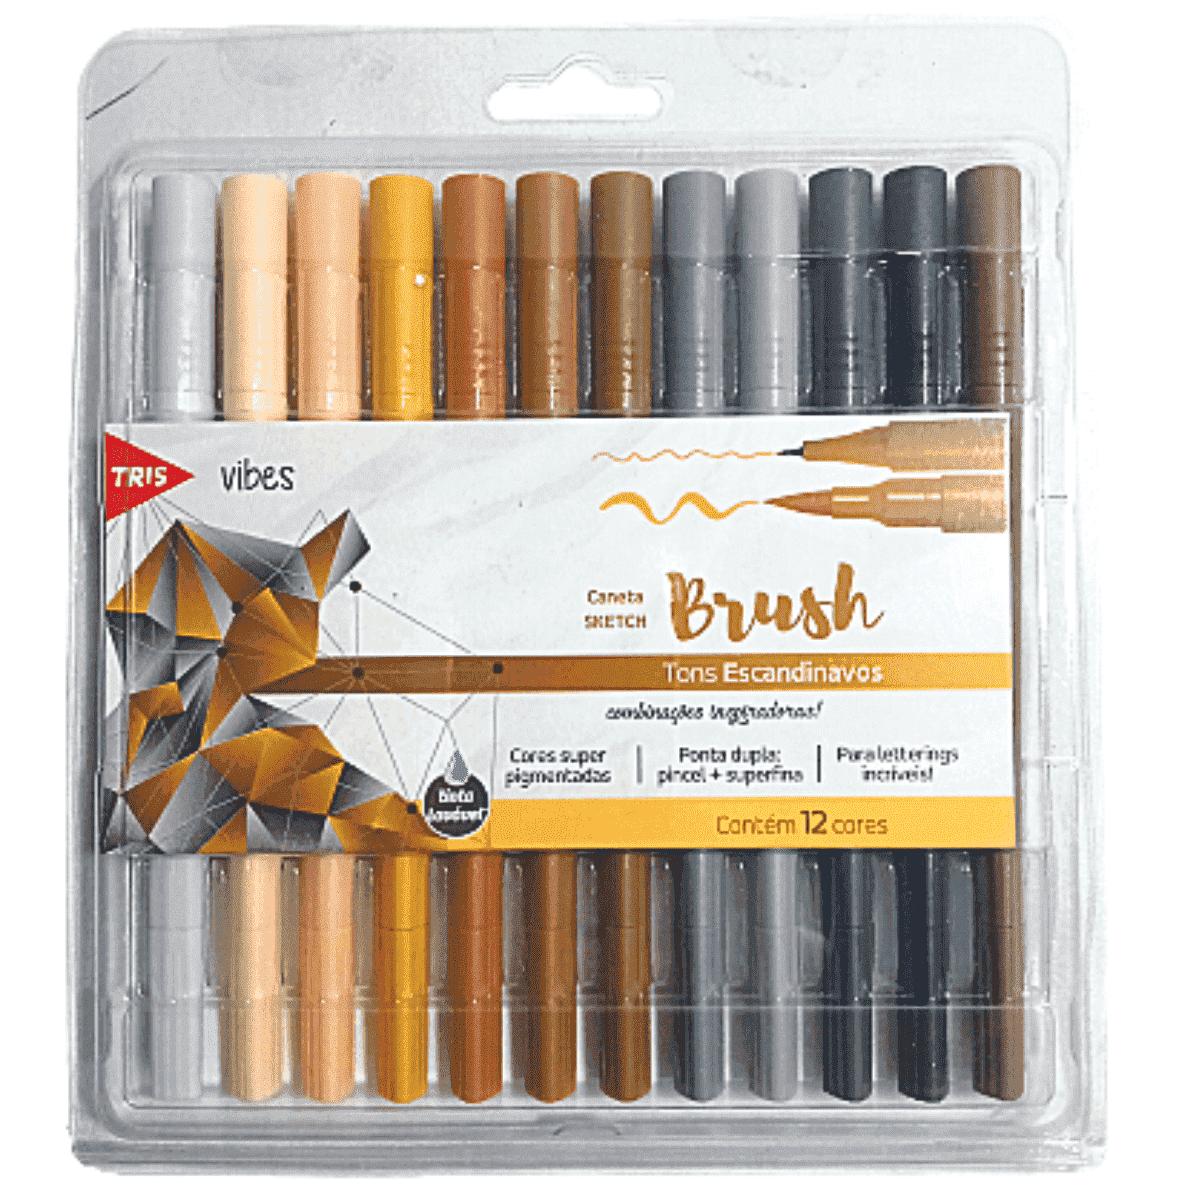 Caneta Pincel Brush Pen Tons Escandinavos - Tris